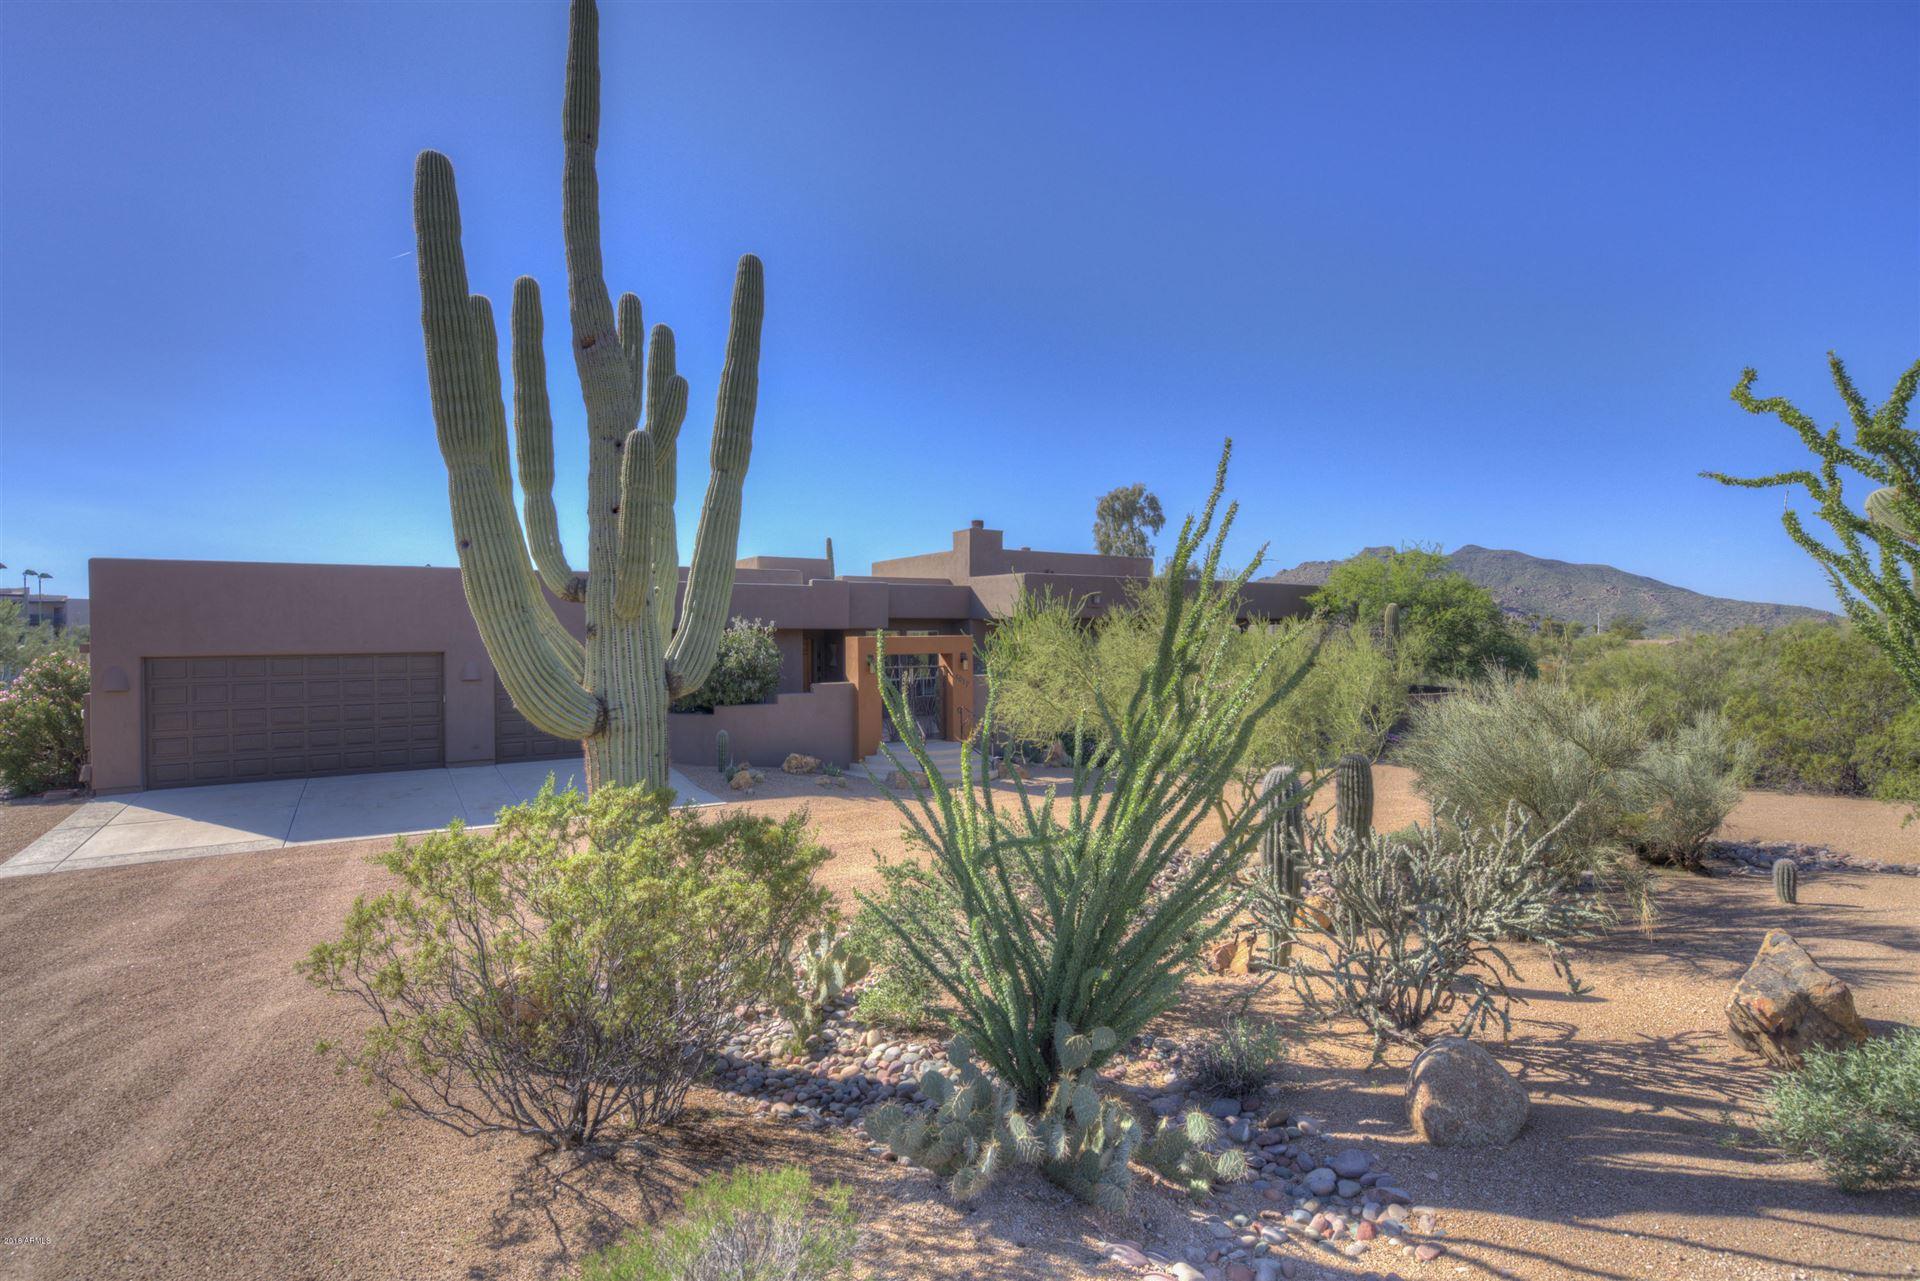 Photo of 8017 E CAREFREE Drive, Carefree, AZ 85377 (MLS # 6223513)